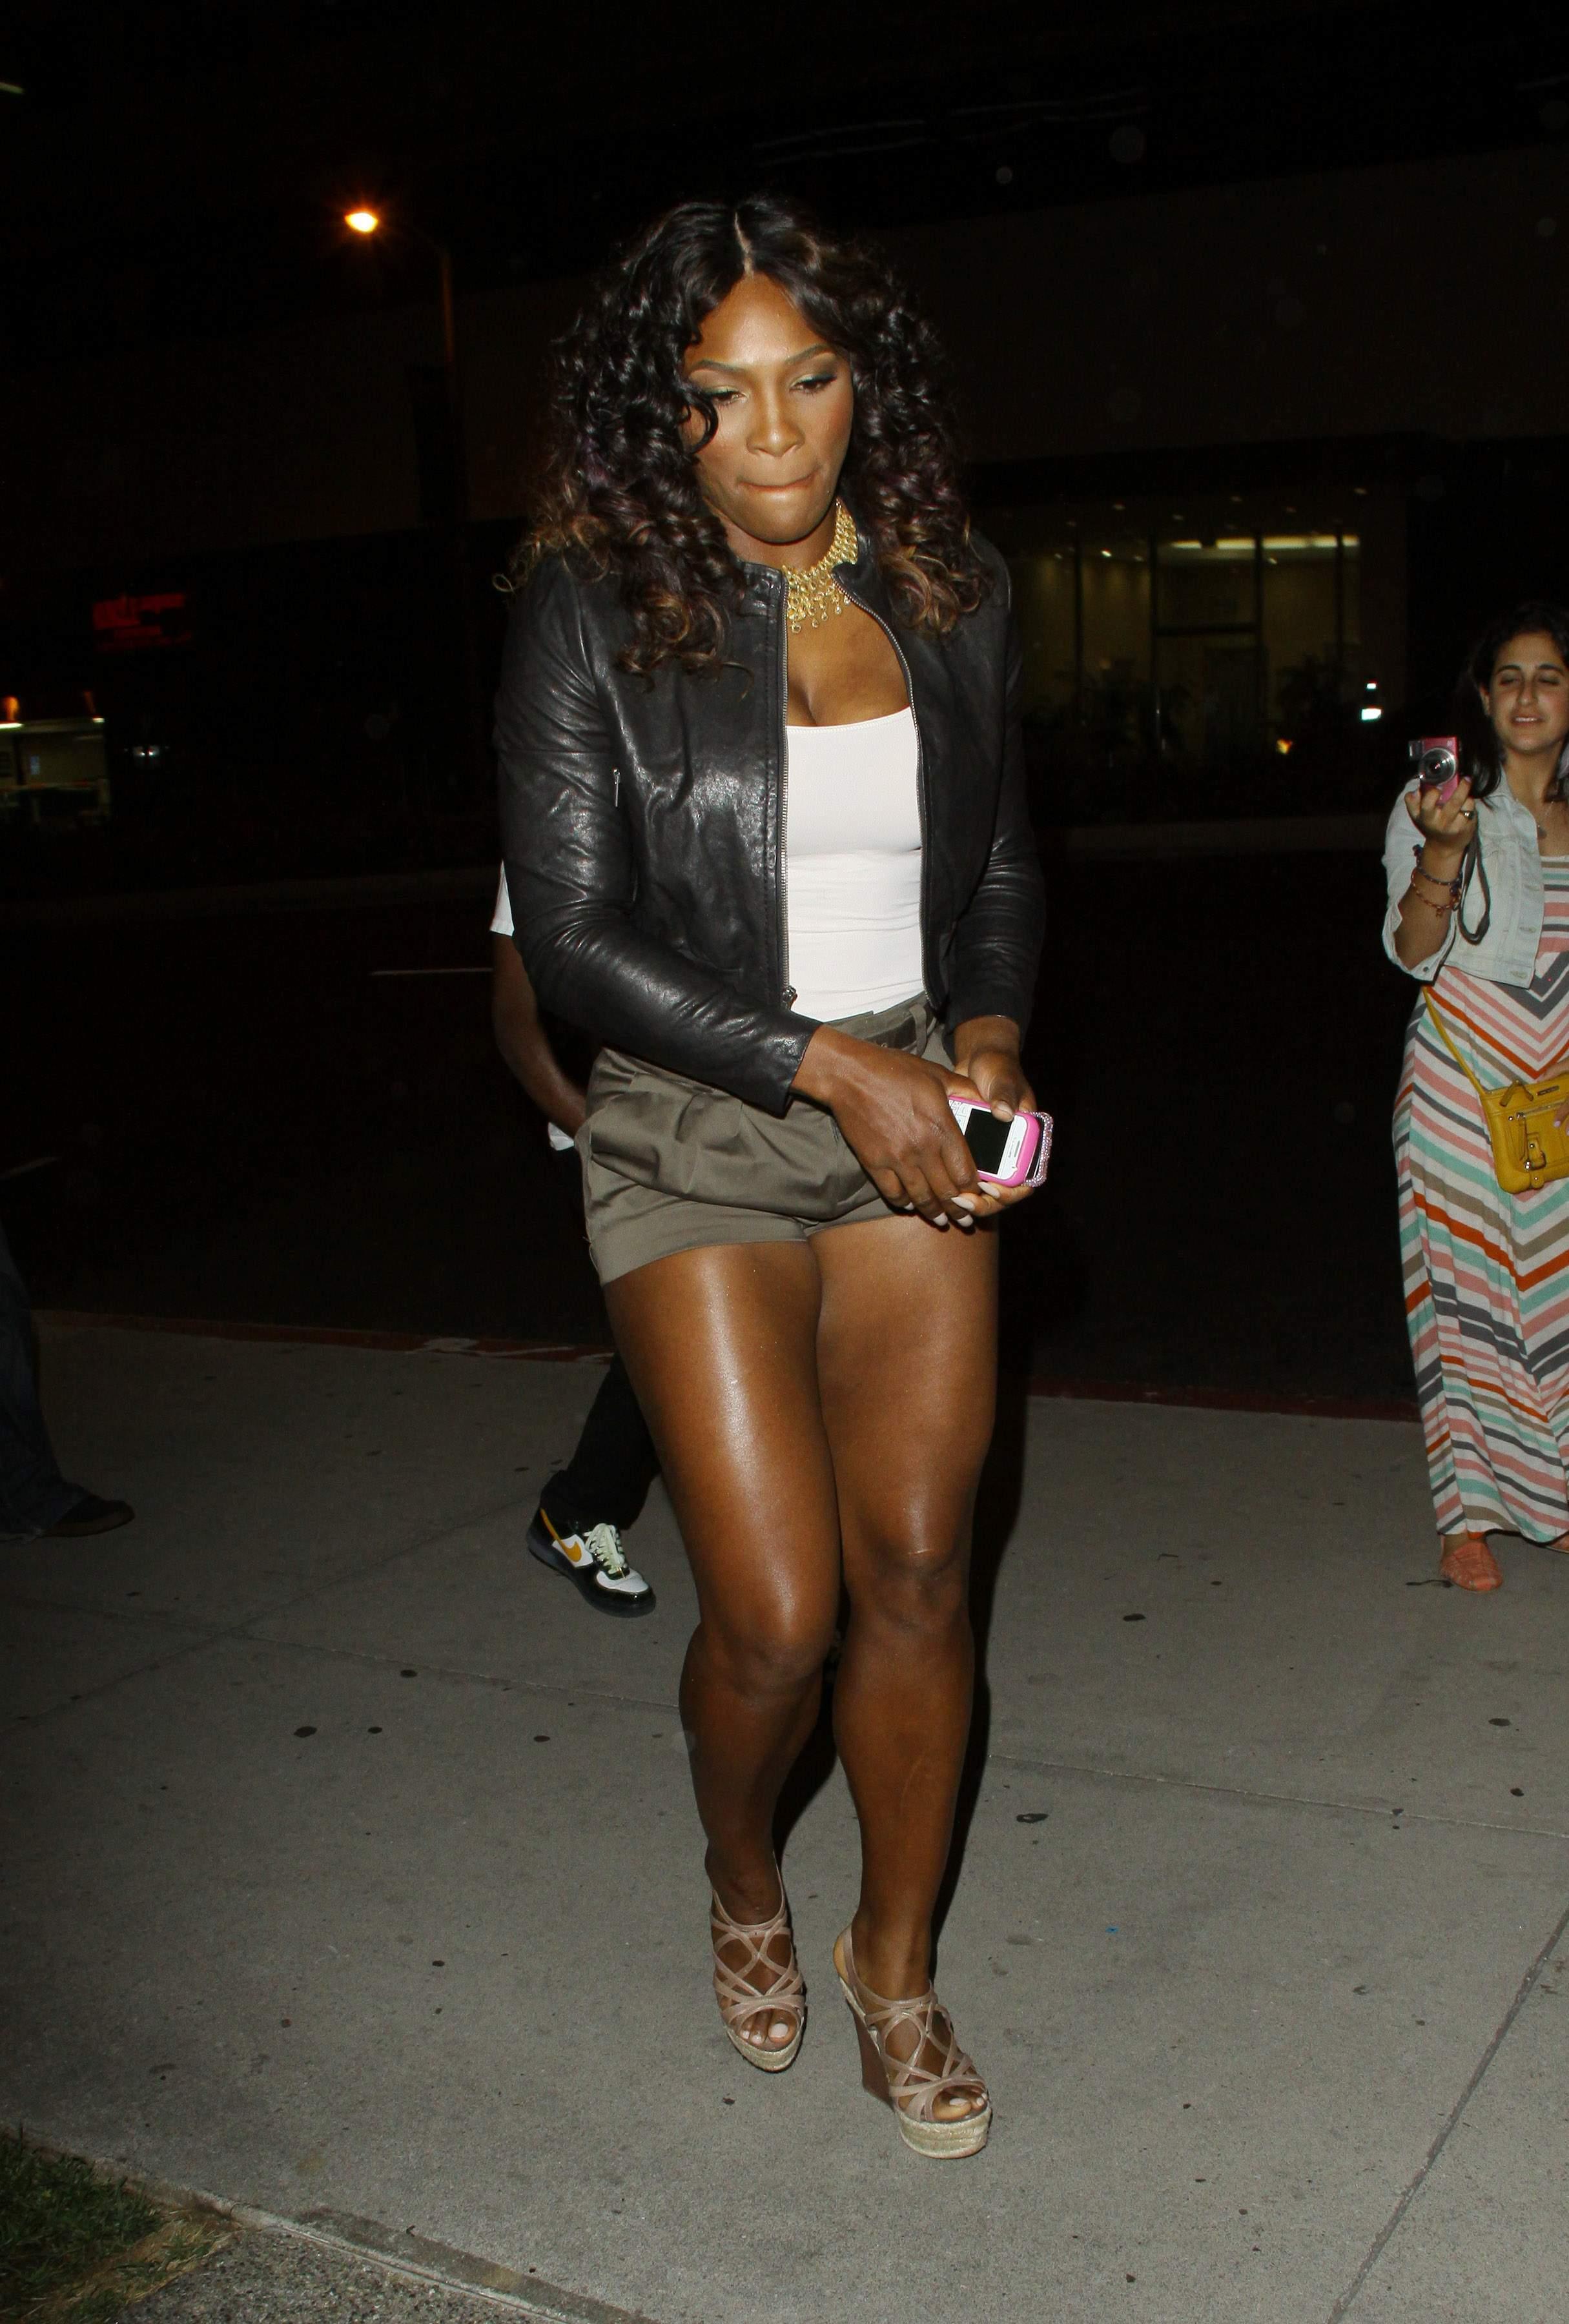 Serena Williams BoaSteakhouseJuly13201115_123_103lo.JPG